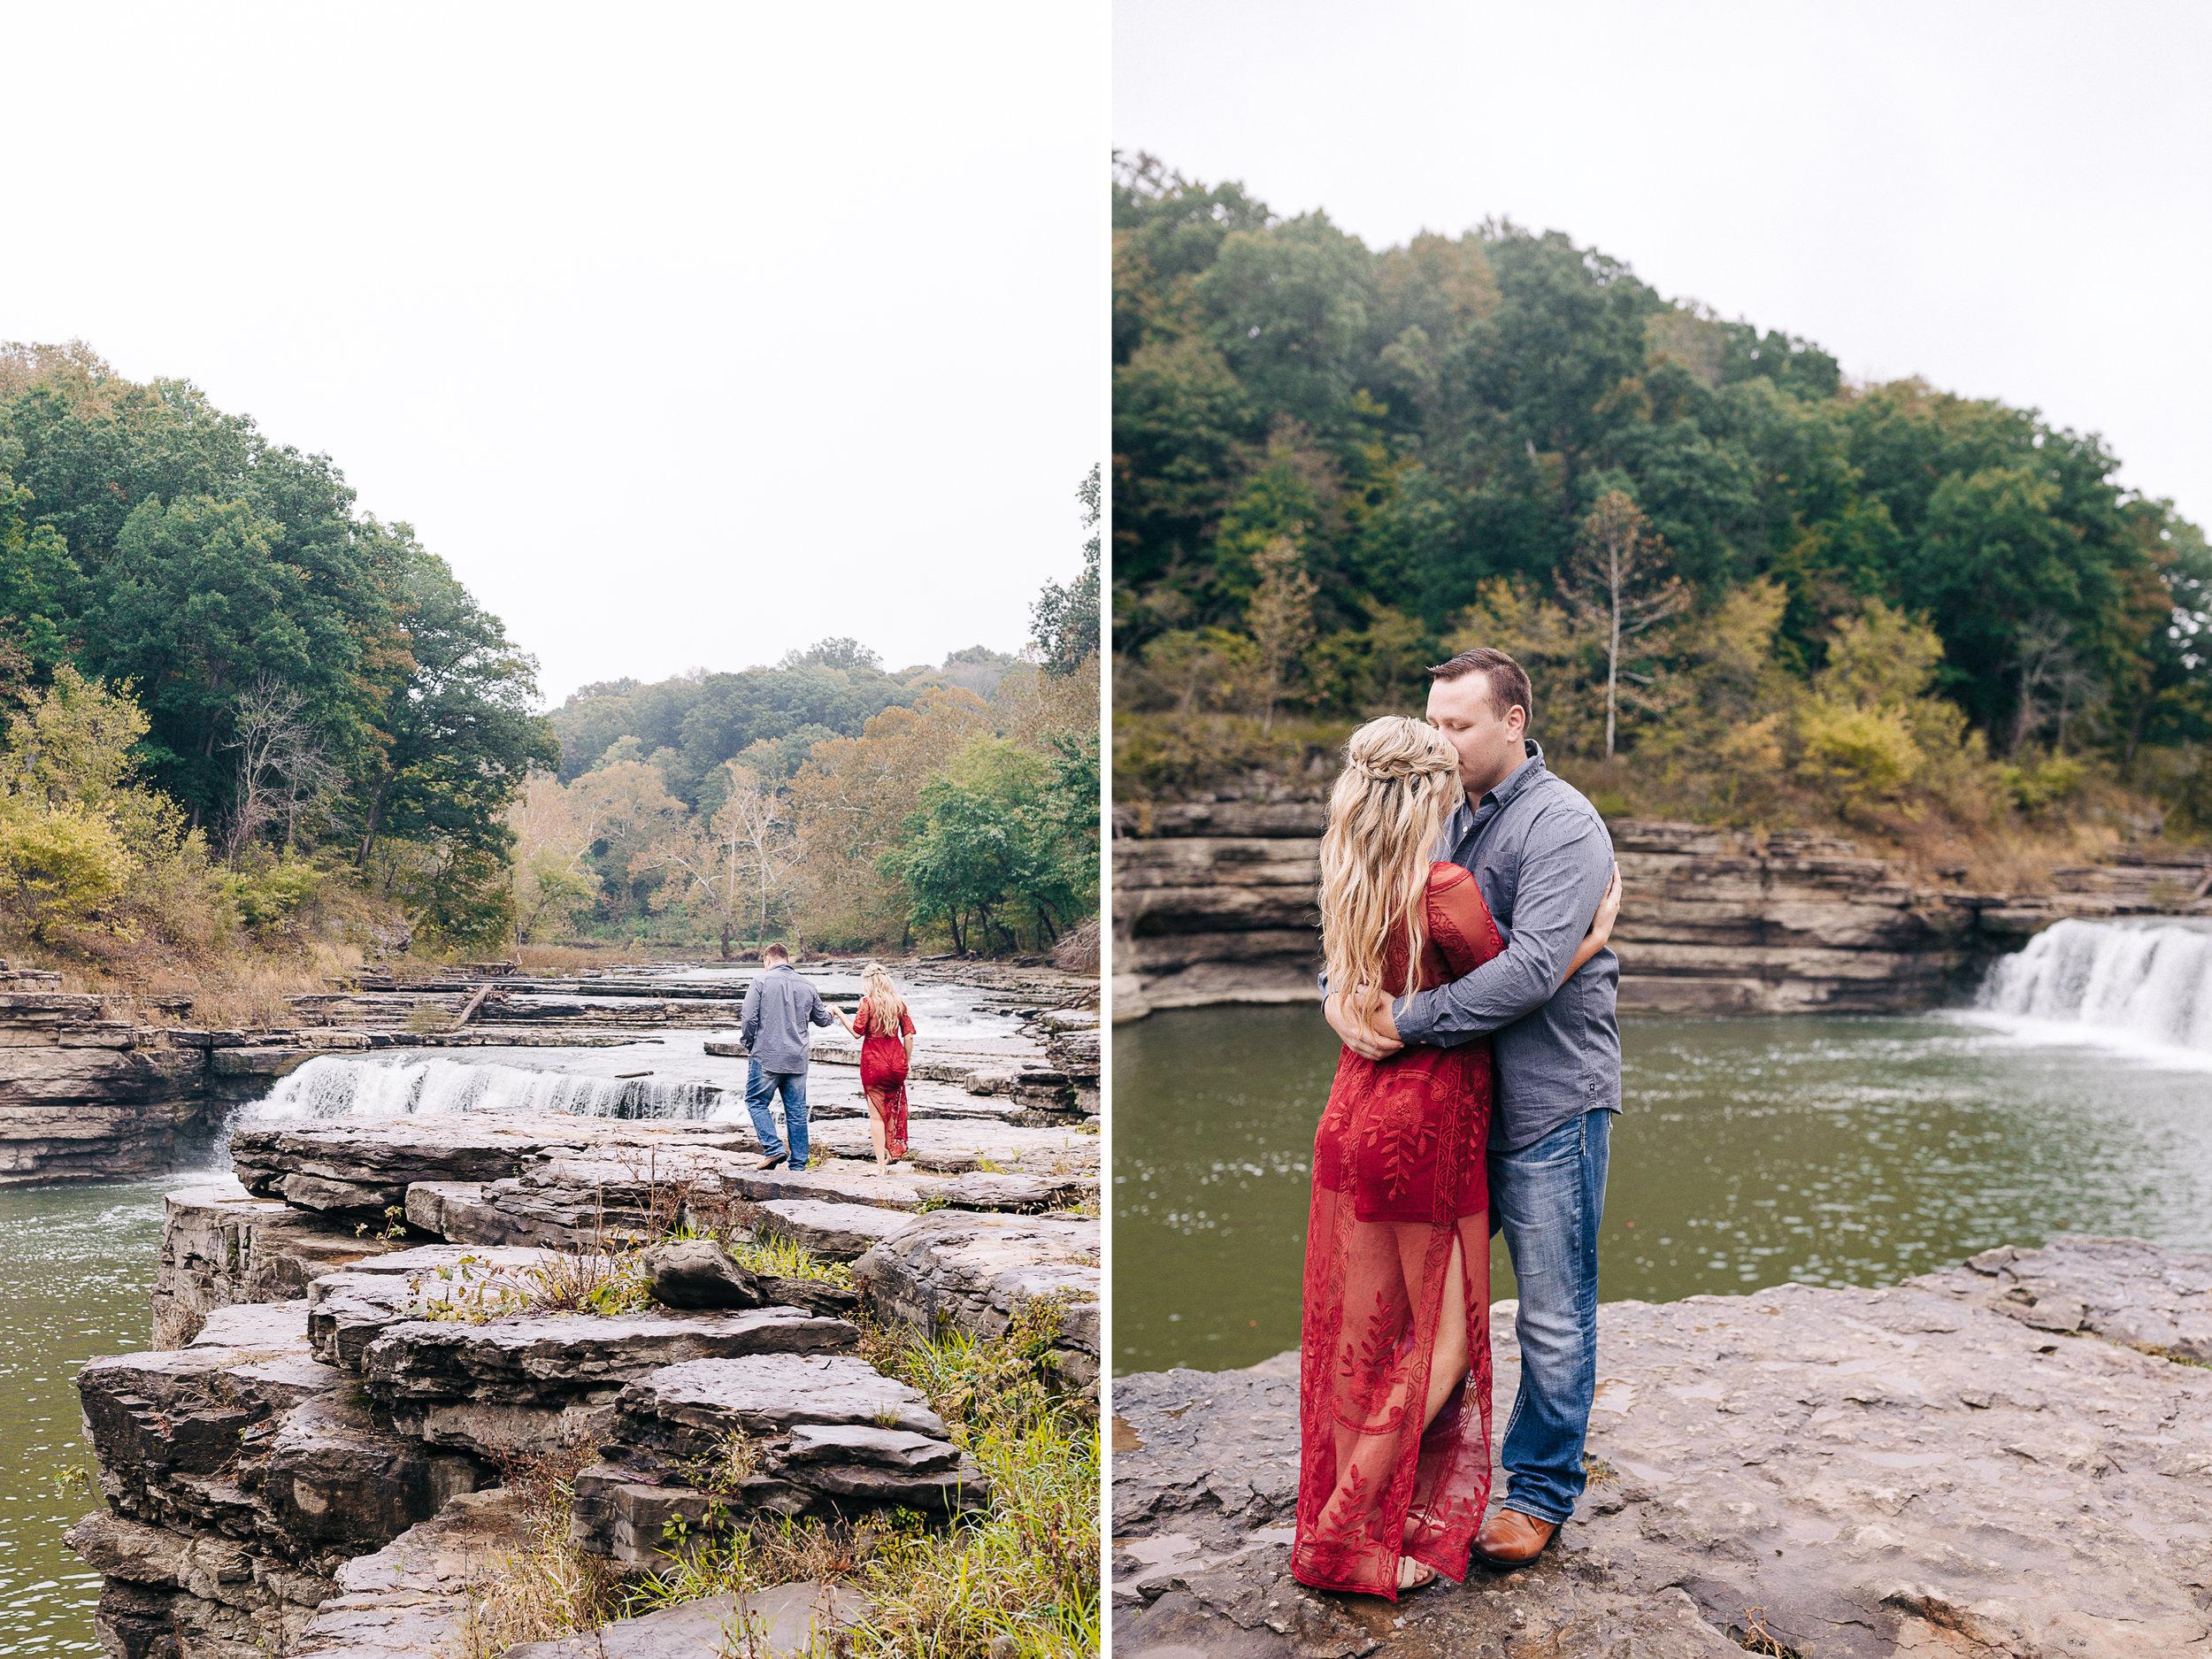 Dorothy_Louise_Photography_Alyssa_Drew_Engagement4.jpg